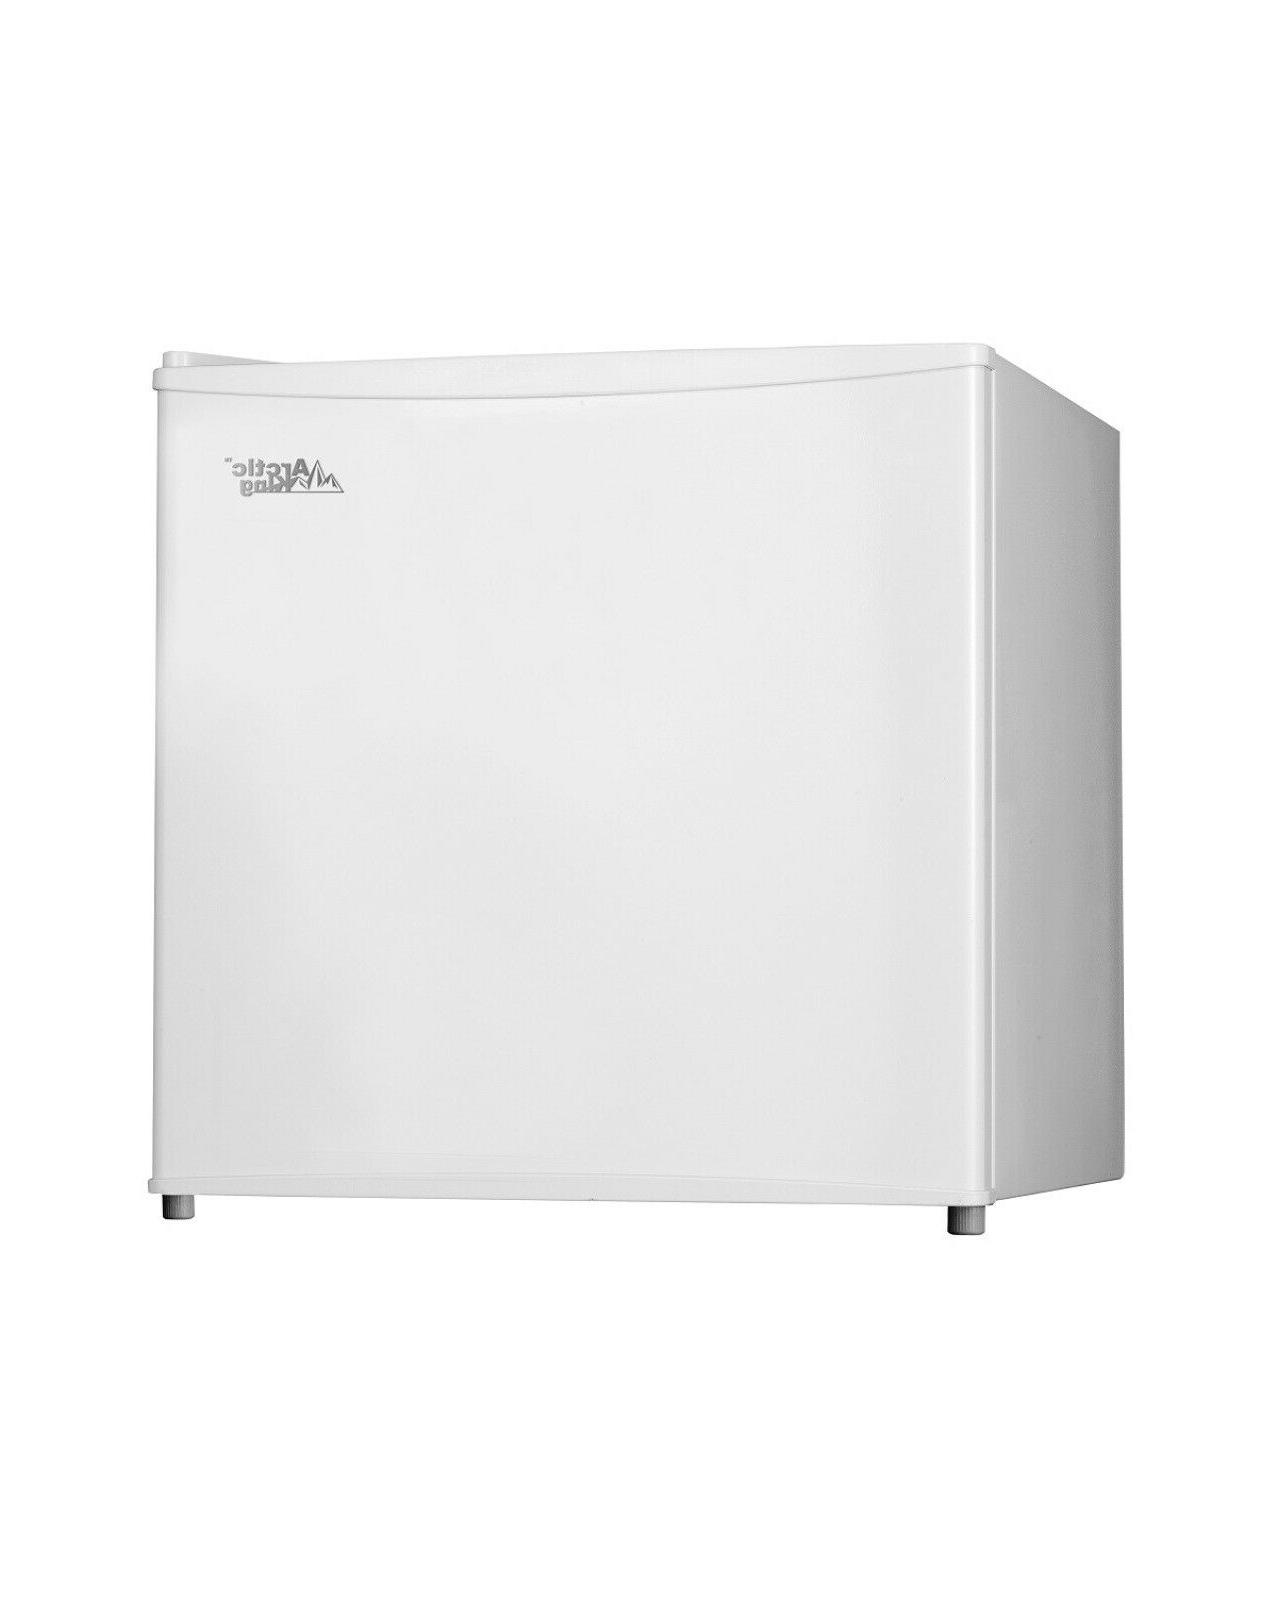 Upright Freezer Unit cu Space Saver White